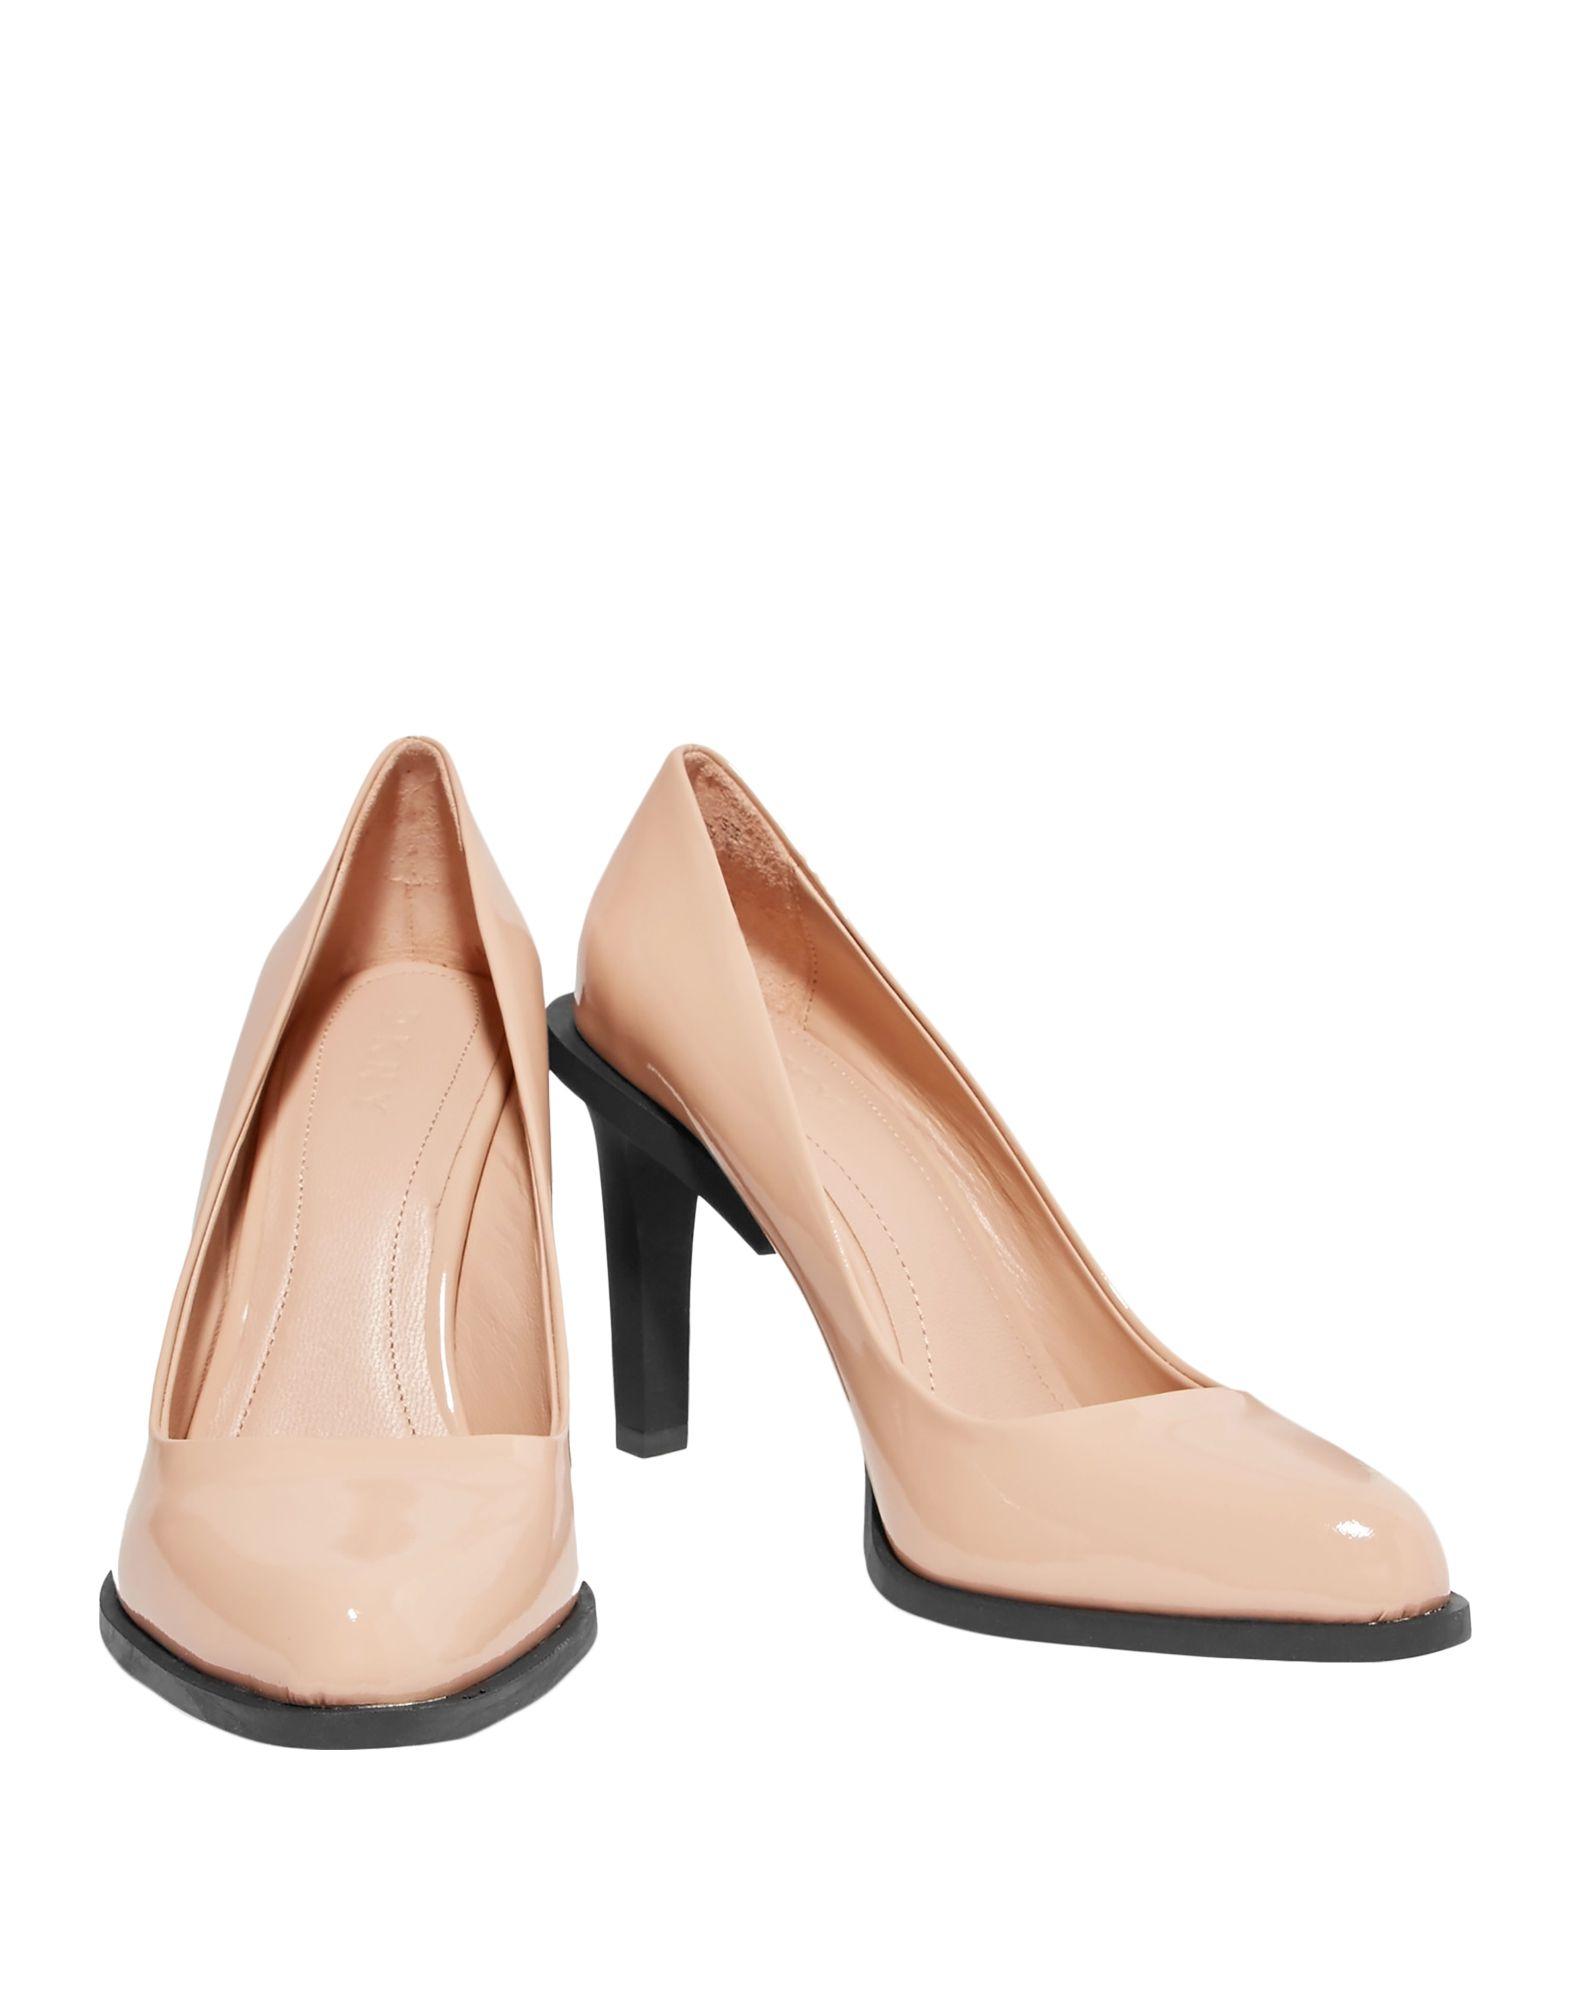 Dkny  Pumps Damen  Dkny 11561393TPGut aussehende strapazierfähige Schuhe a2e95e